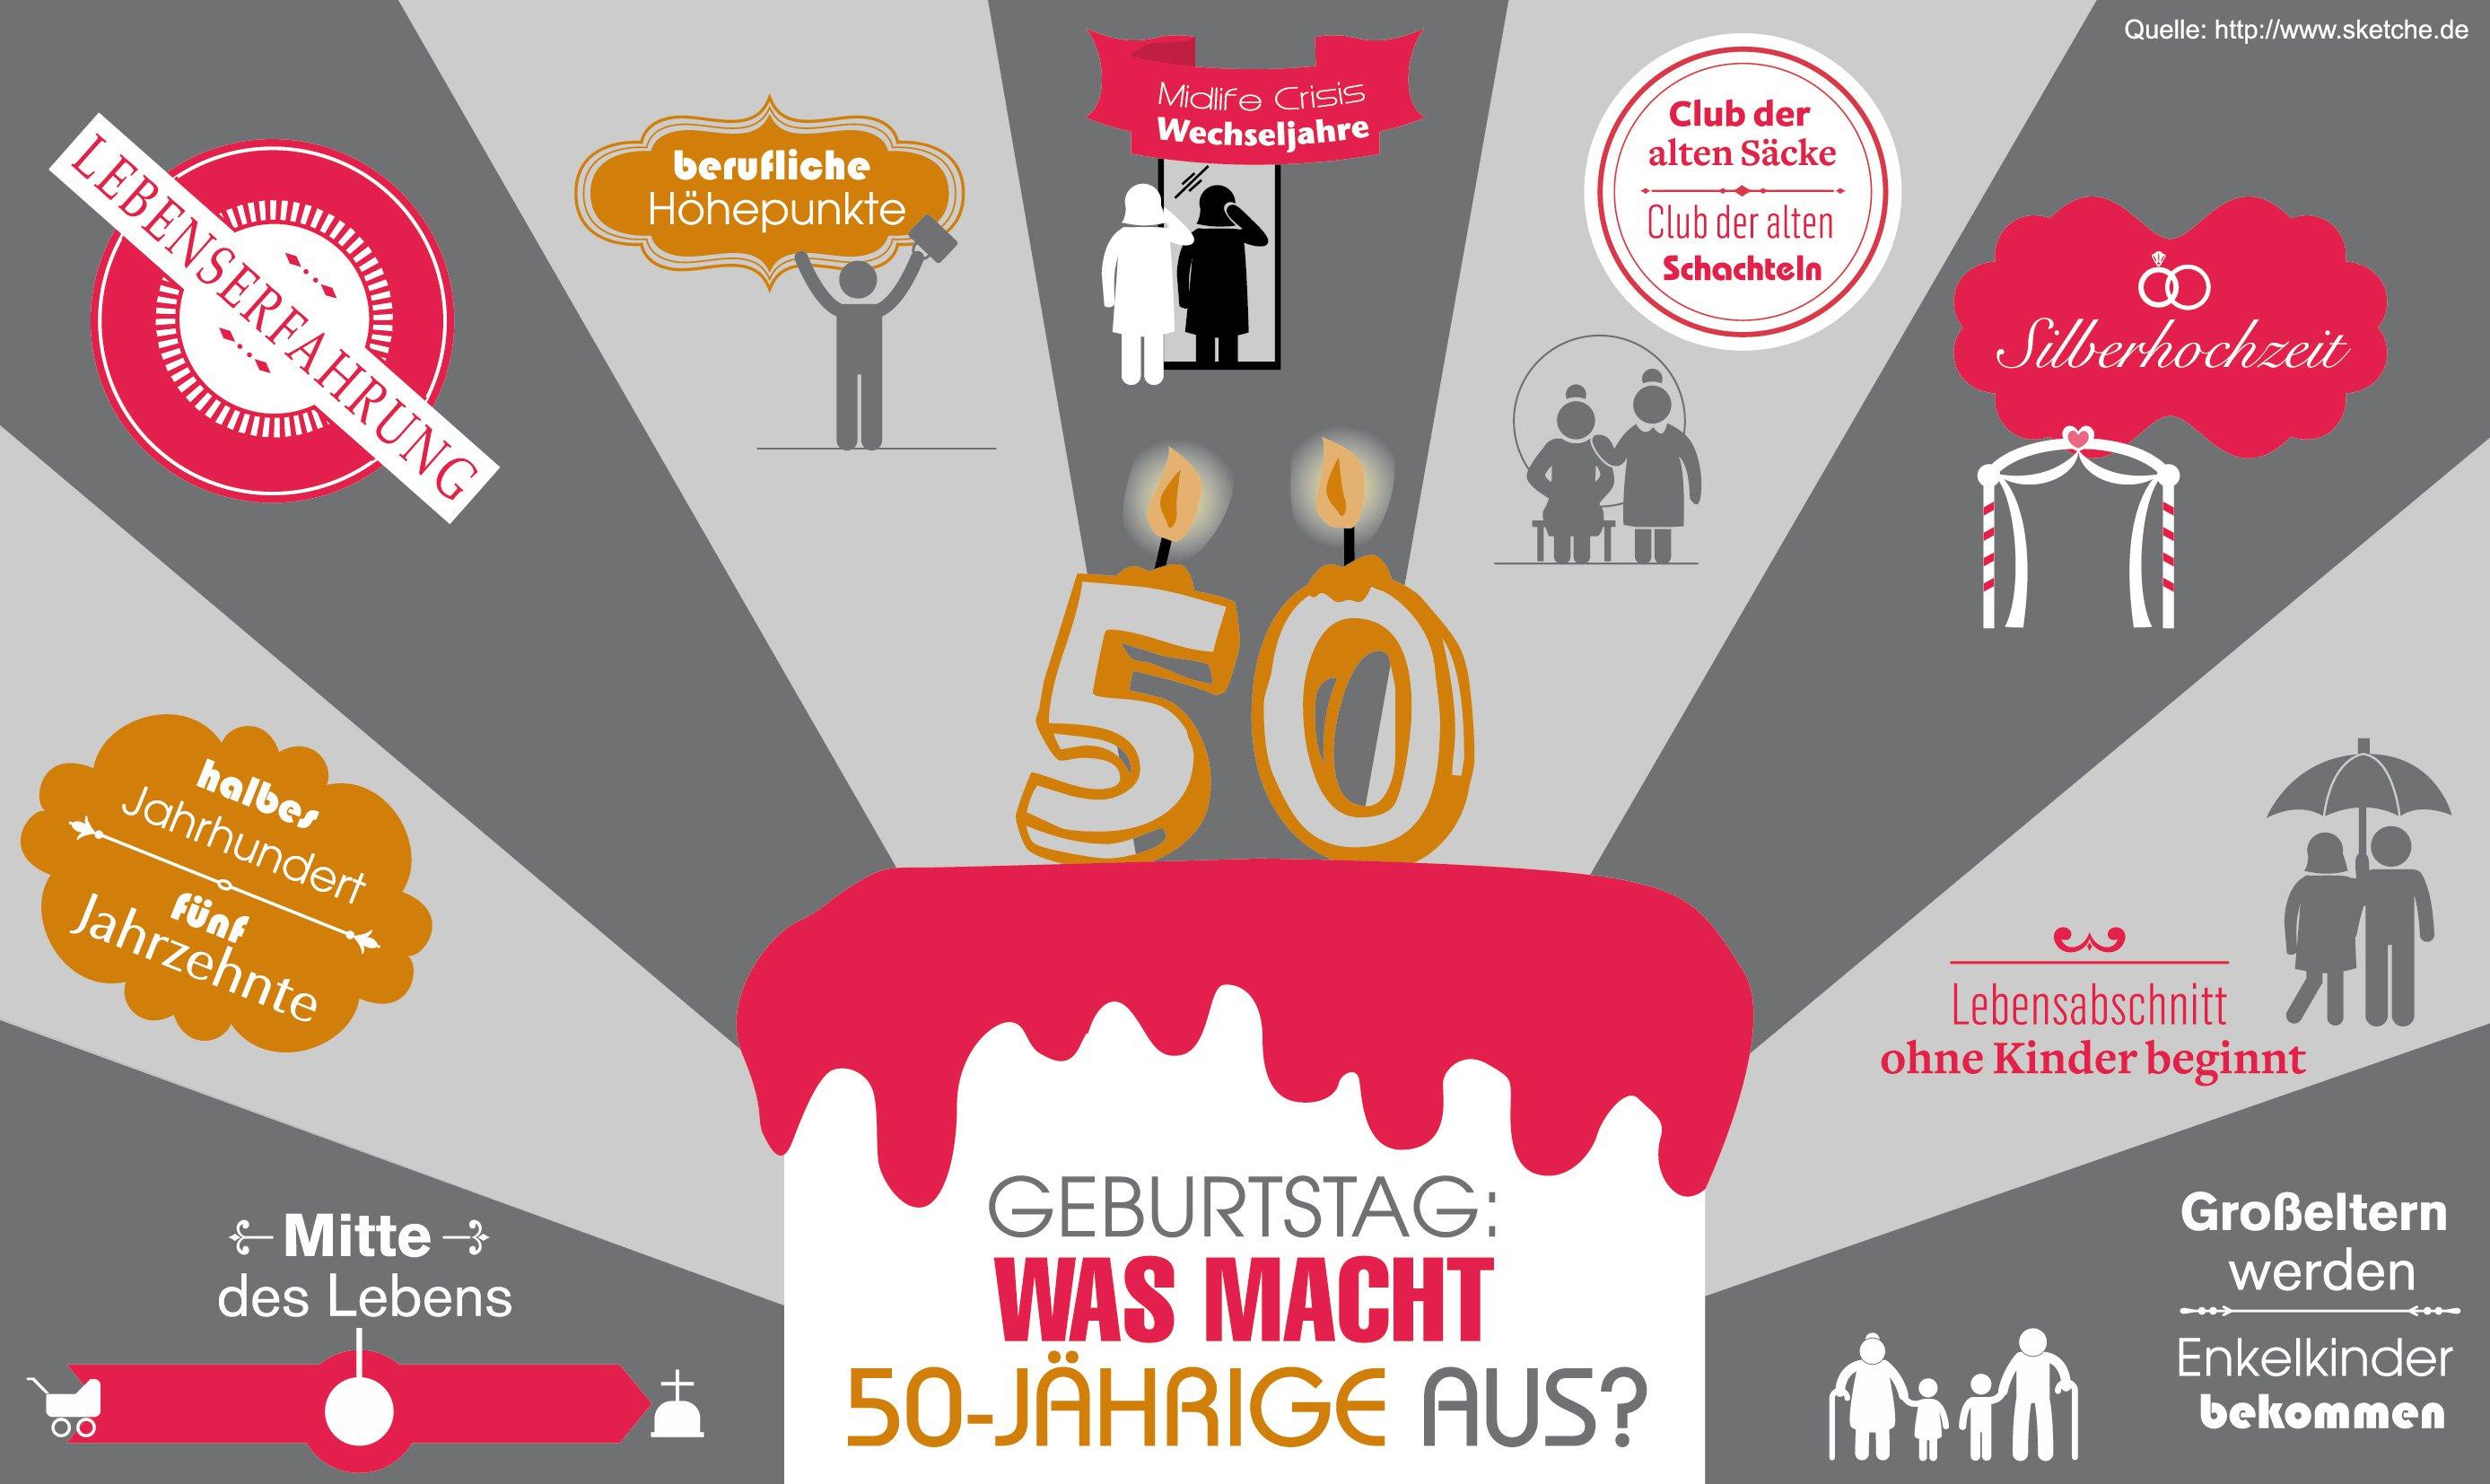 Einladungen Geburtstag: Einladung Geburtstag : Einladungen Zum 50 Geburtstag